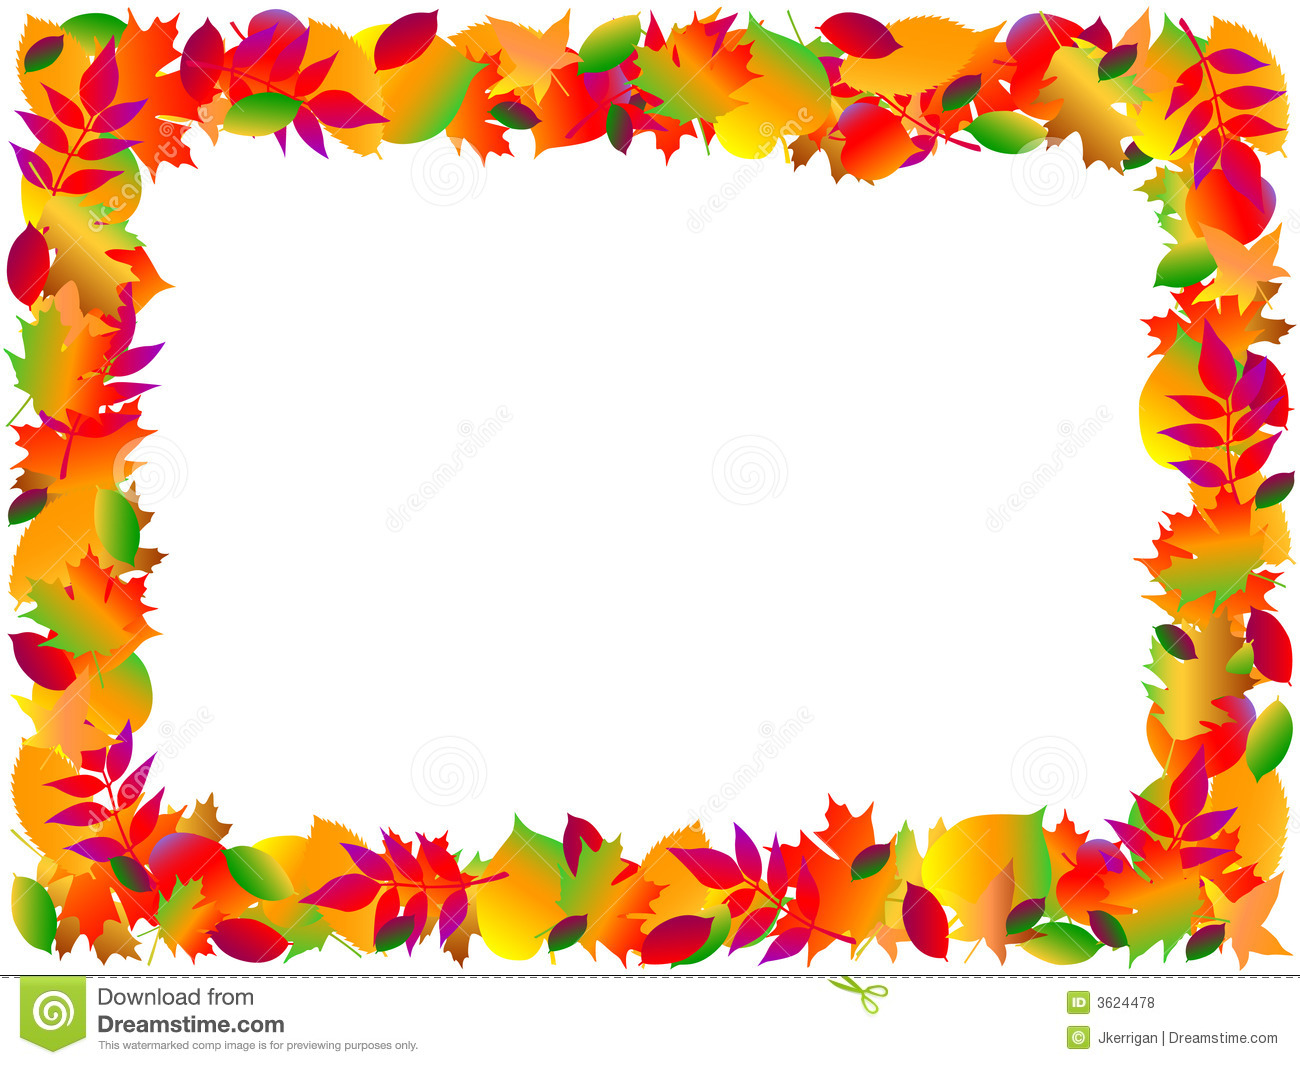 Fall Harvest Border Clipart.